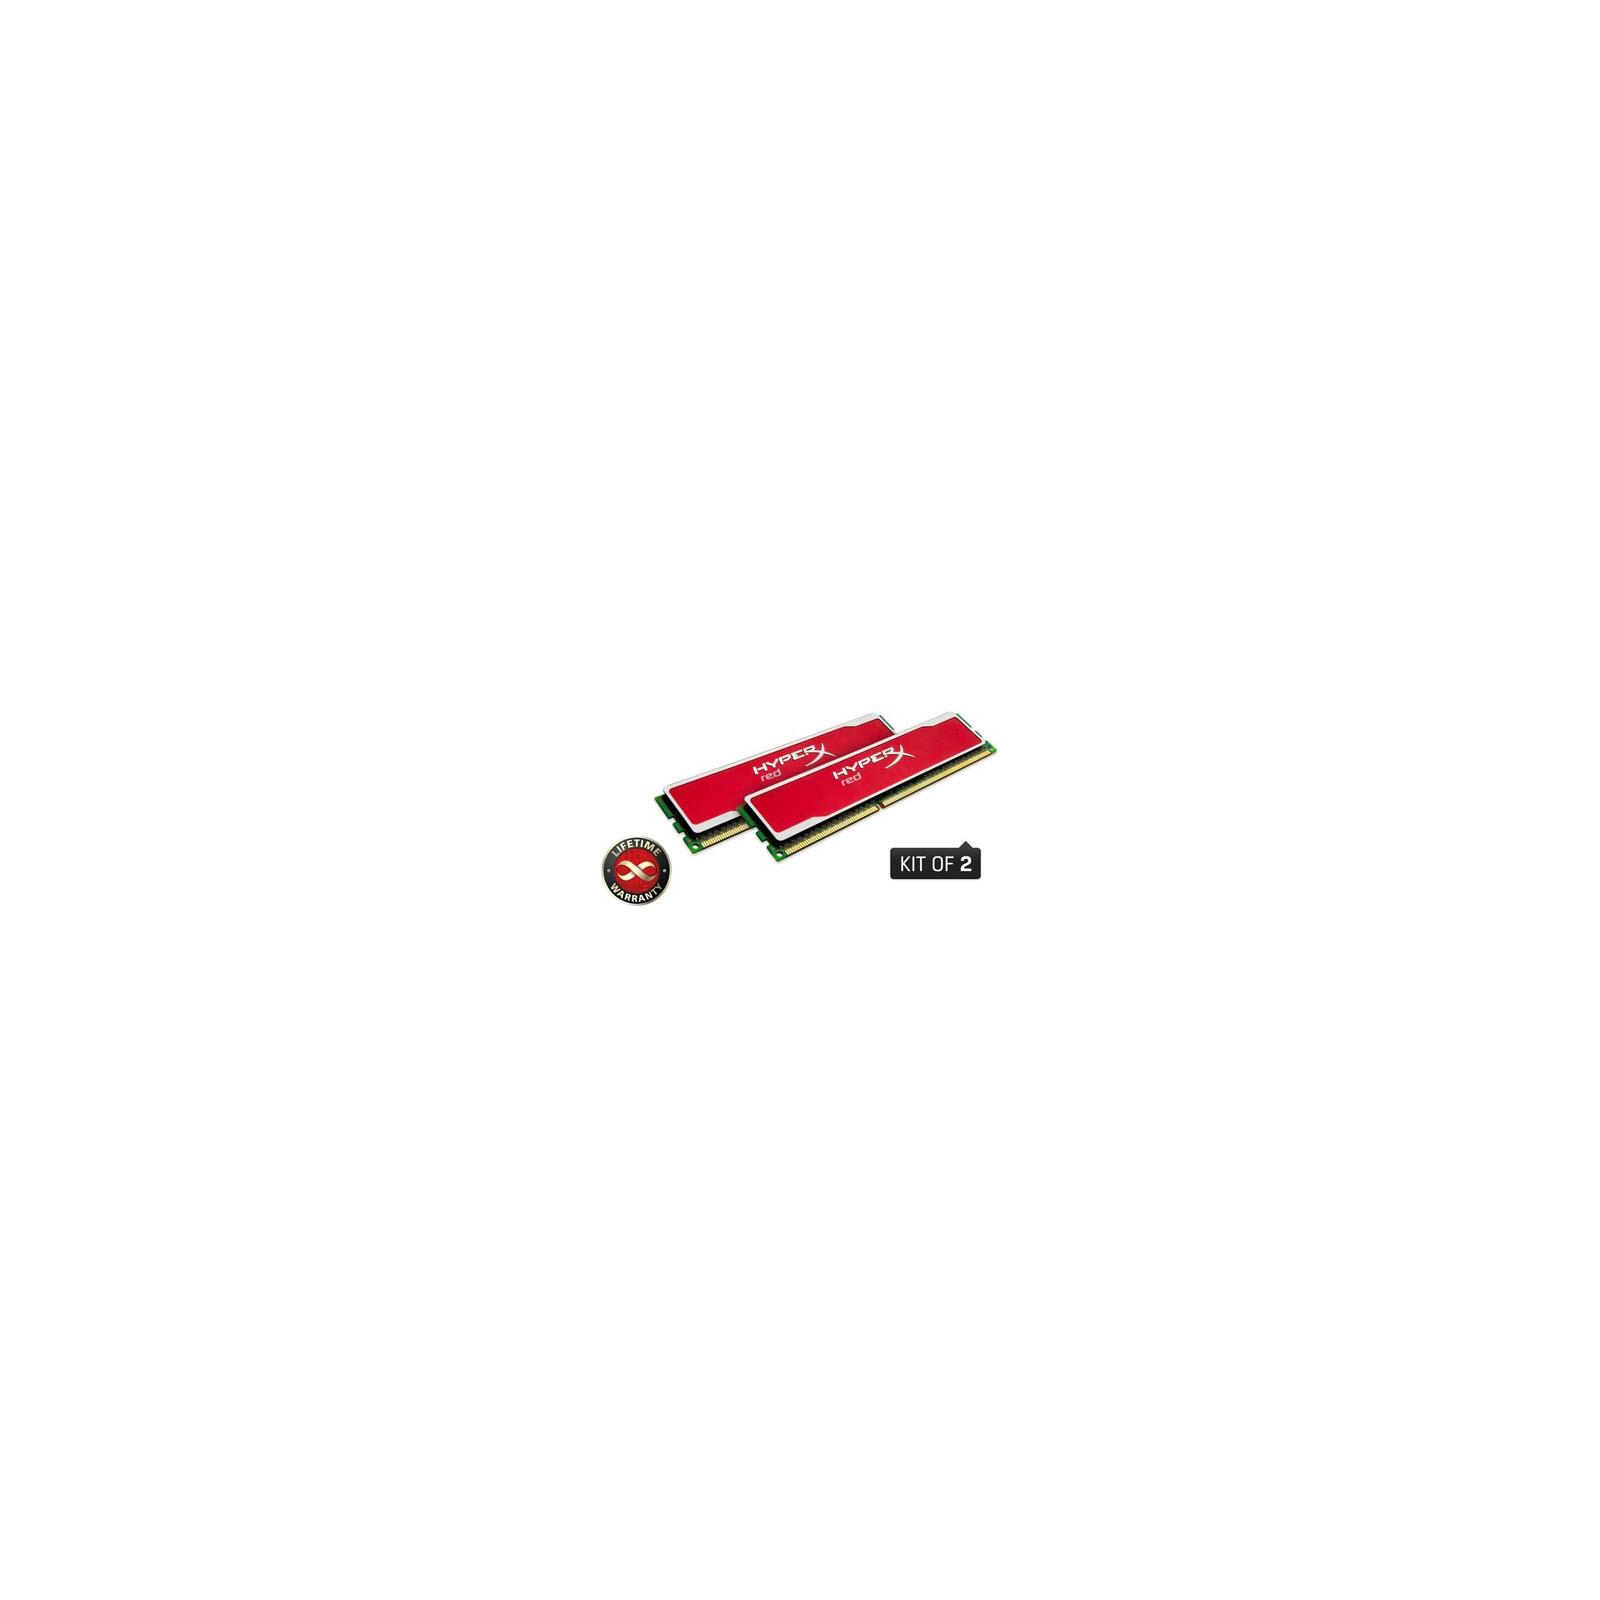 Модуль памяти для компьютера DDR3 8GB (2x4GB) 1600 MHz Kingston (KHX16C9B1RK2/8X / KHX16C9B1RK2/8)